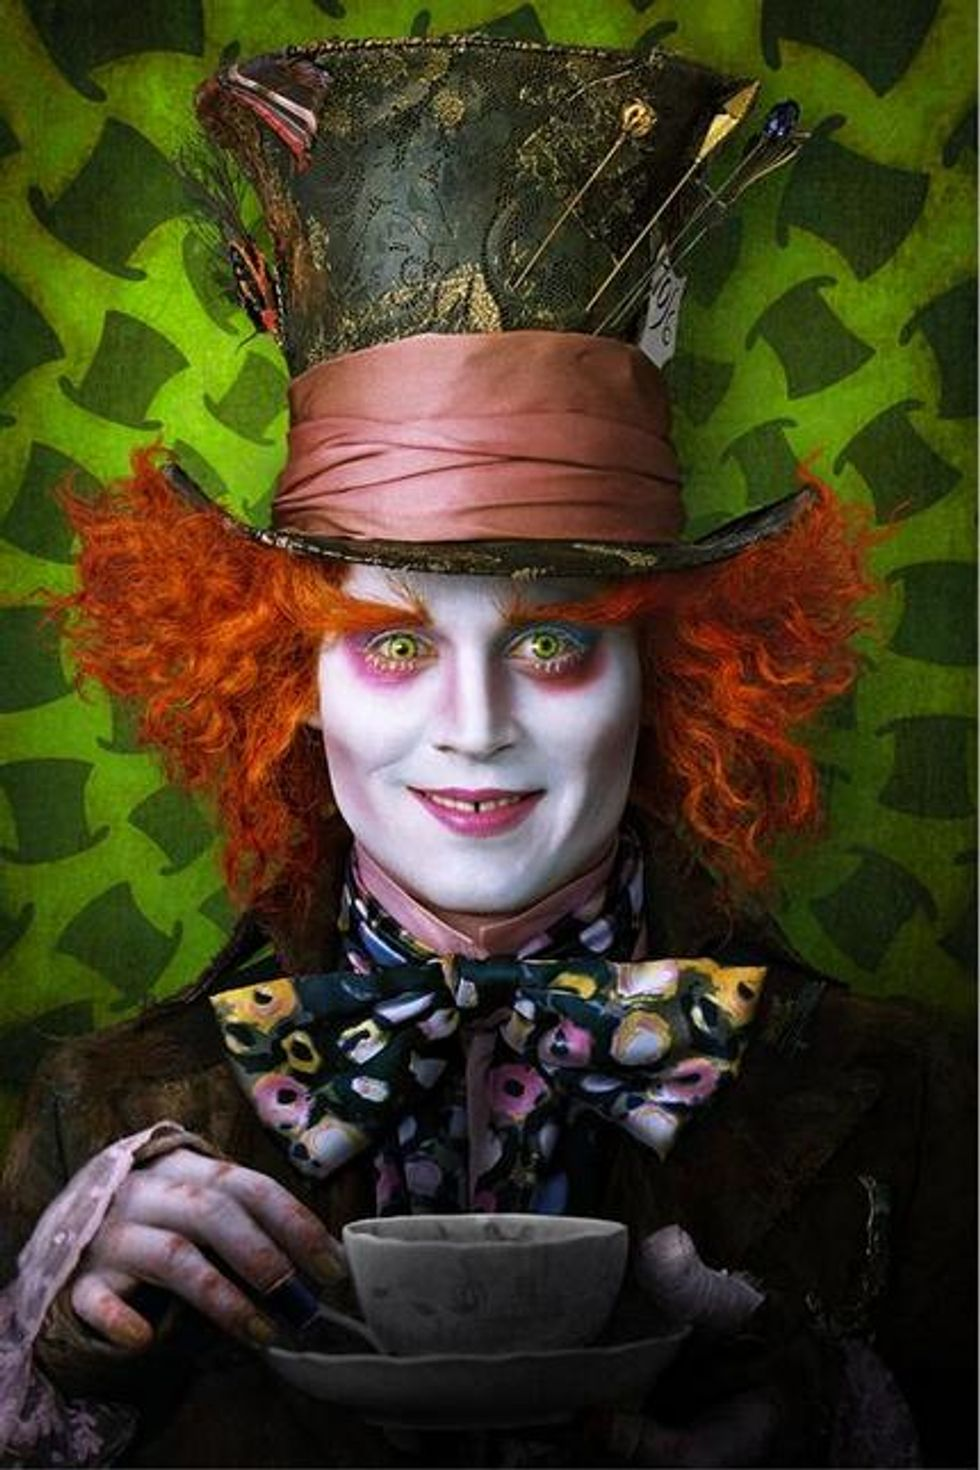 Tim Burton's Alice In Wonderland On DVD: Feed Your Head